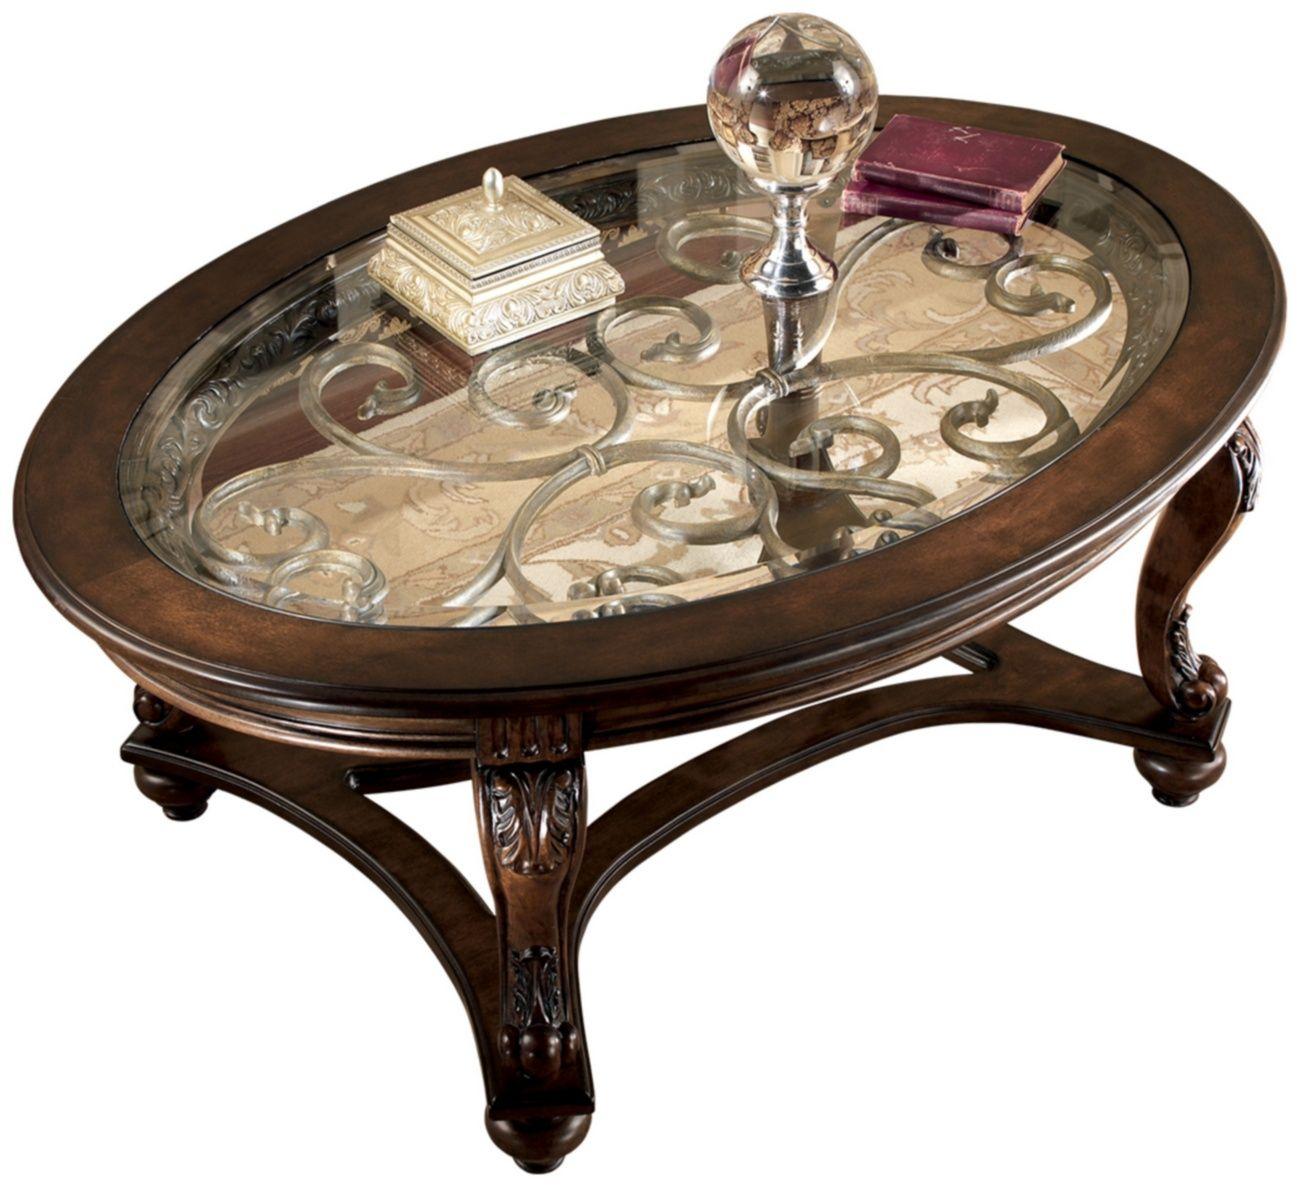 Signature Design Norcastle Oval Cocktail Table Ashley Furniture T499 0